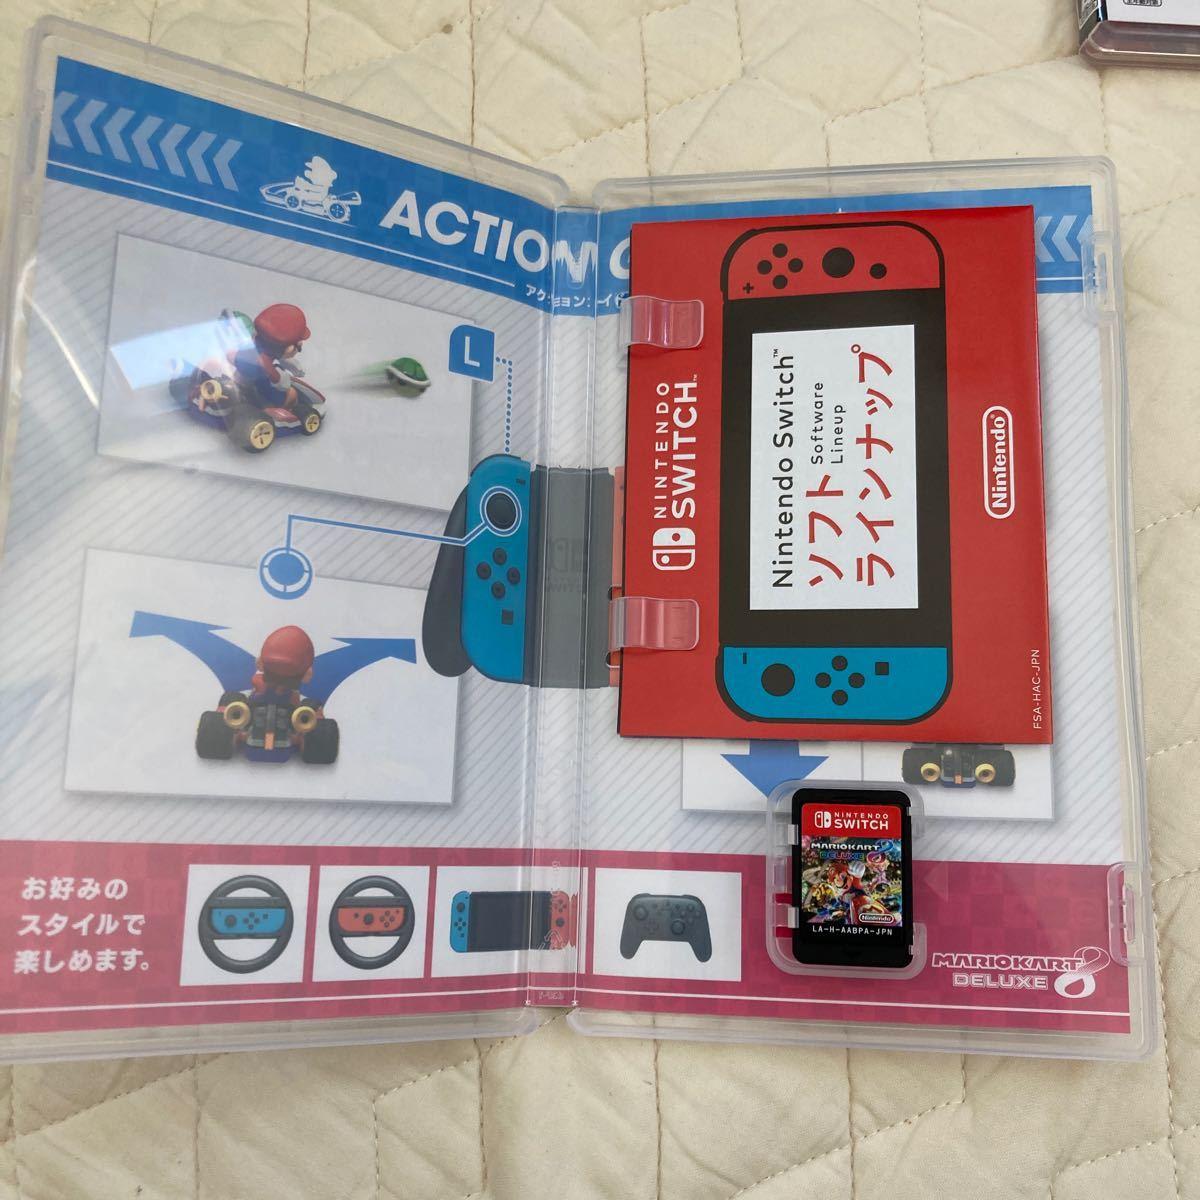 Switch 2本セット マリオカート8デラックス 桃太郎電鉄